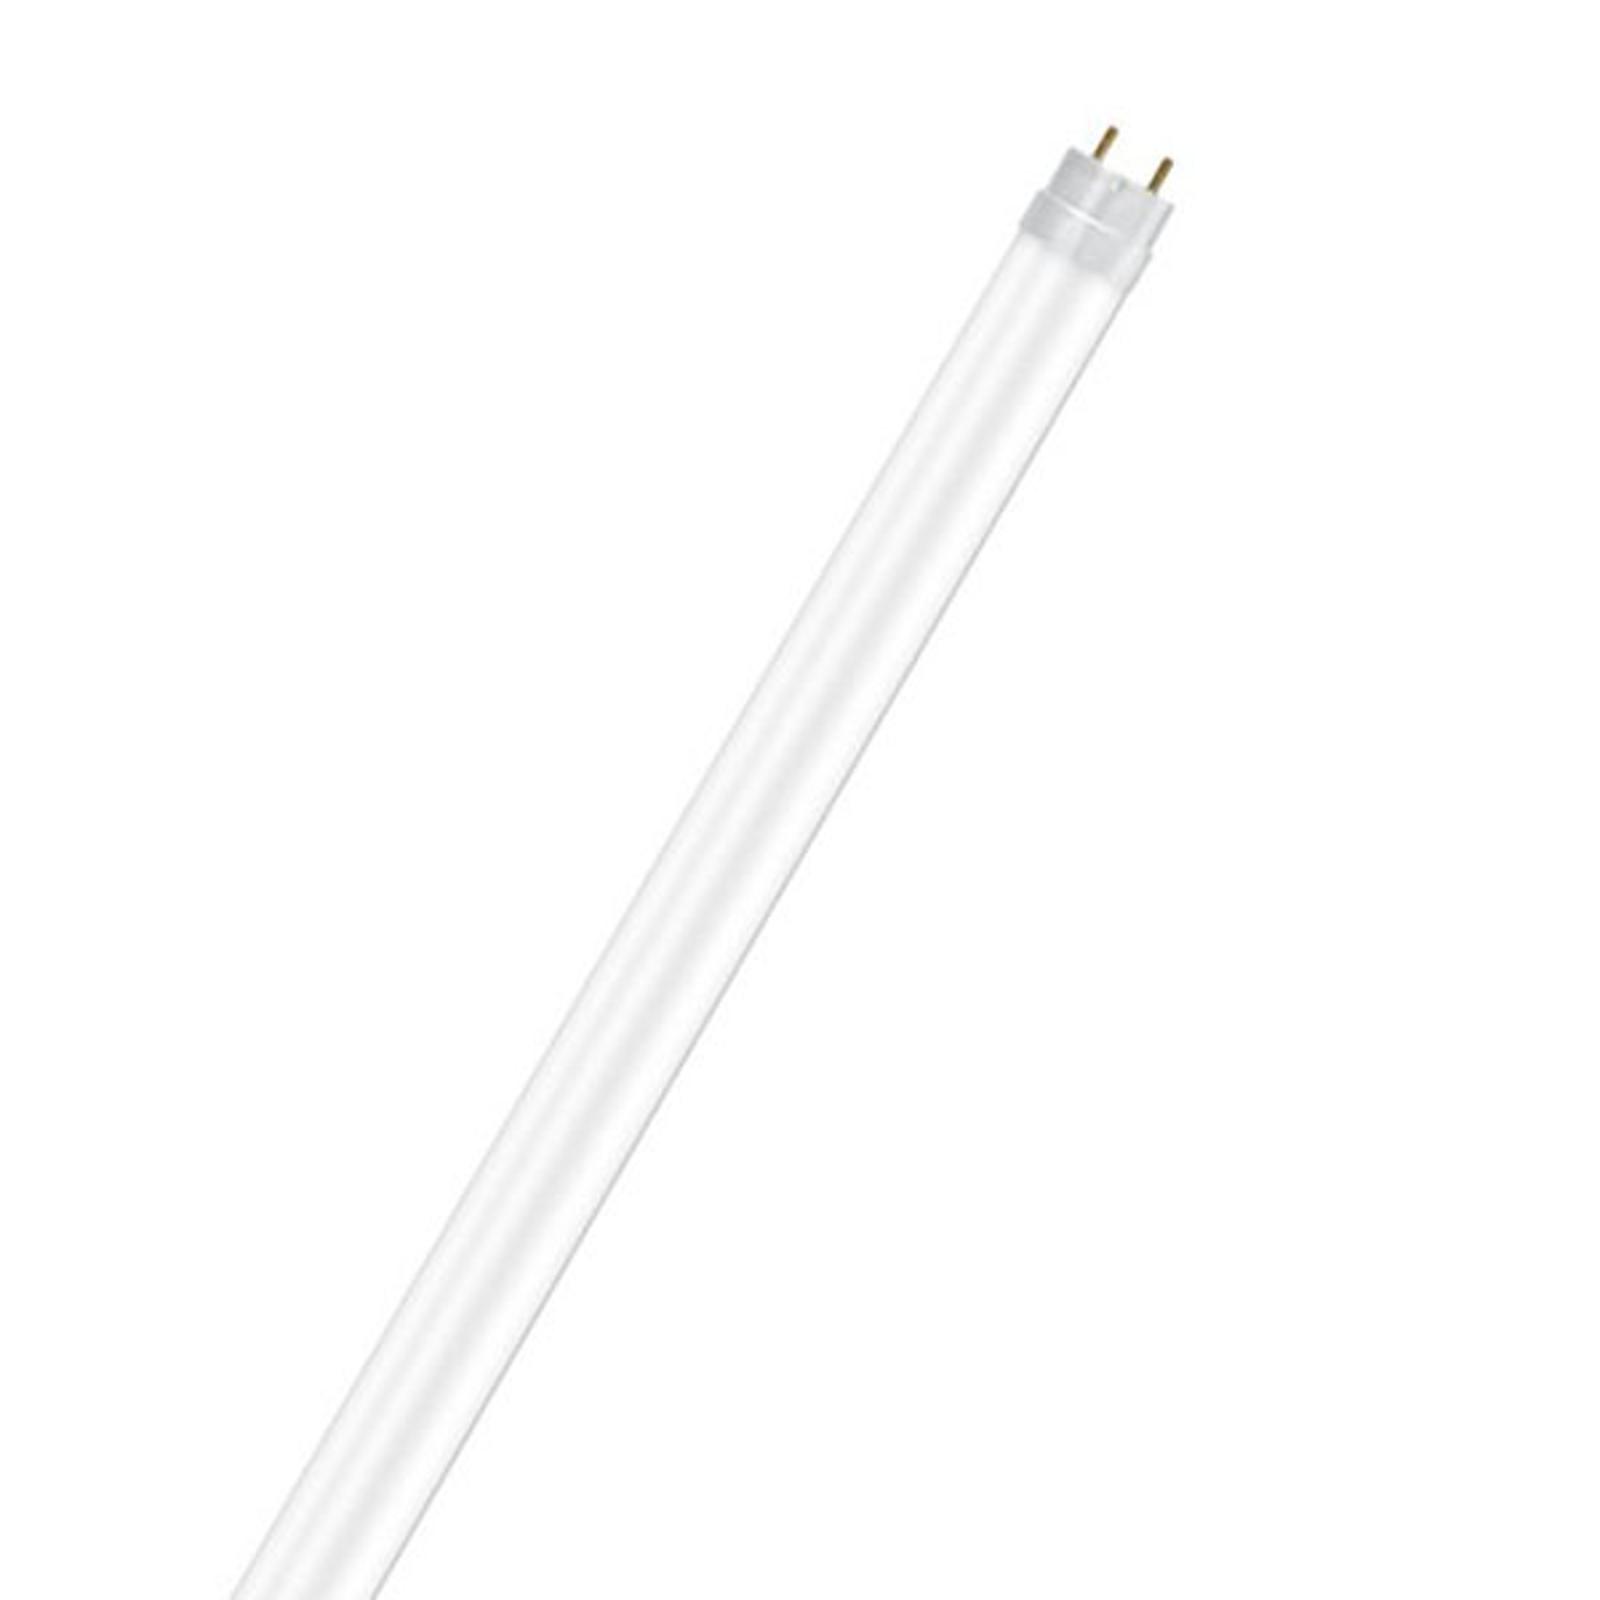 OSRAM-LED-putki G13 T8 60cm SubstiTUBE 6,6W 4 000K